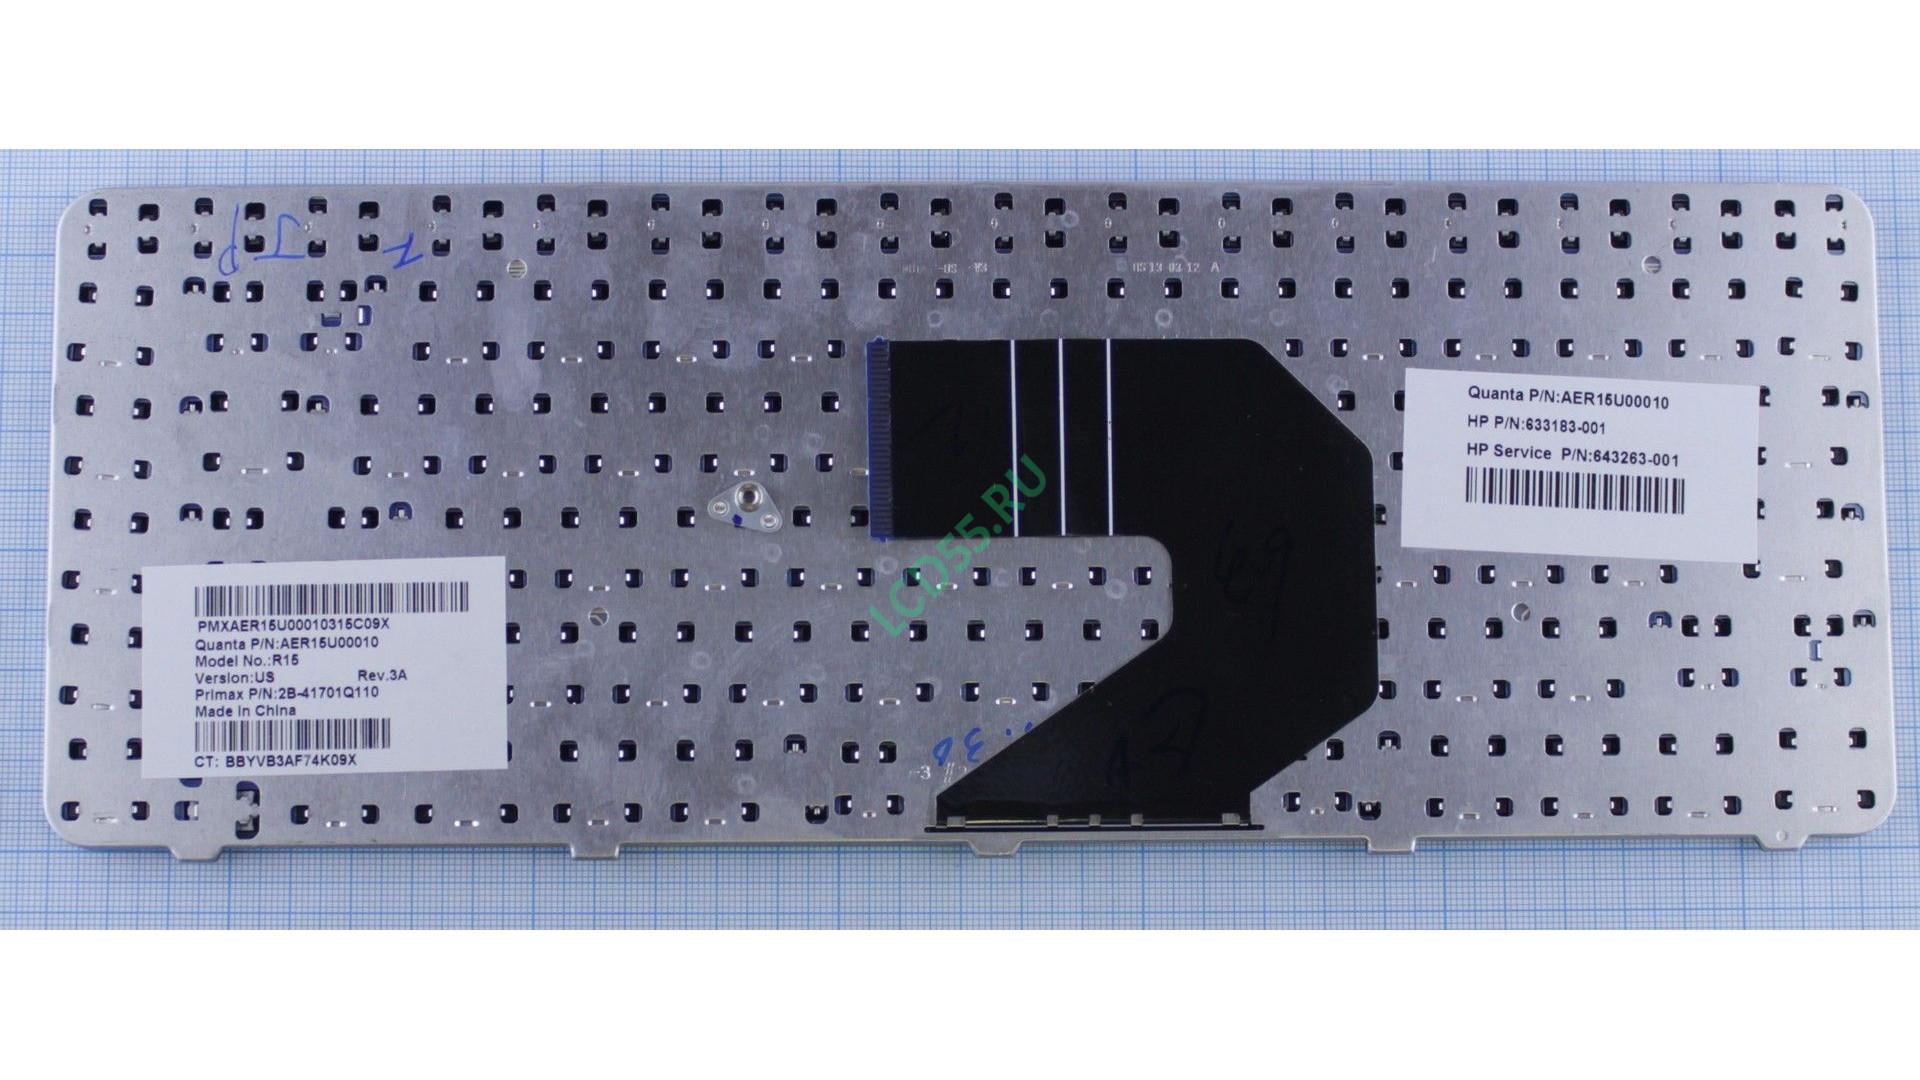 Клавиатура HP Pavilion G4-1000, G6-1000, CQ43, 57, 58, 630, 635, 650, 655 (AER15700010, AER157U0010) (черная)